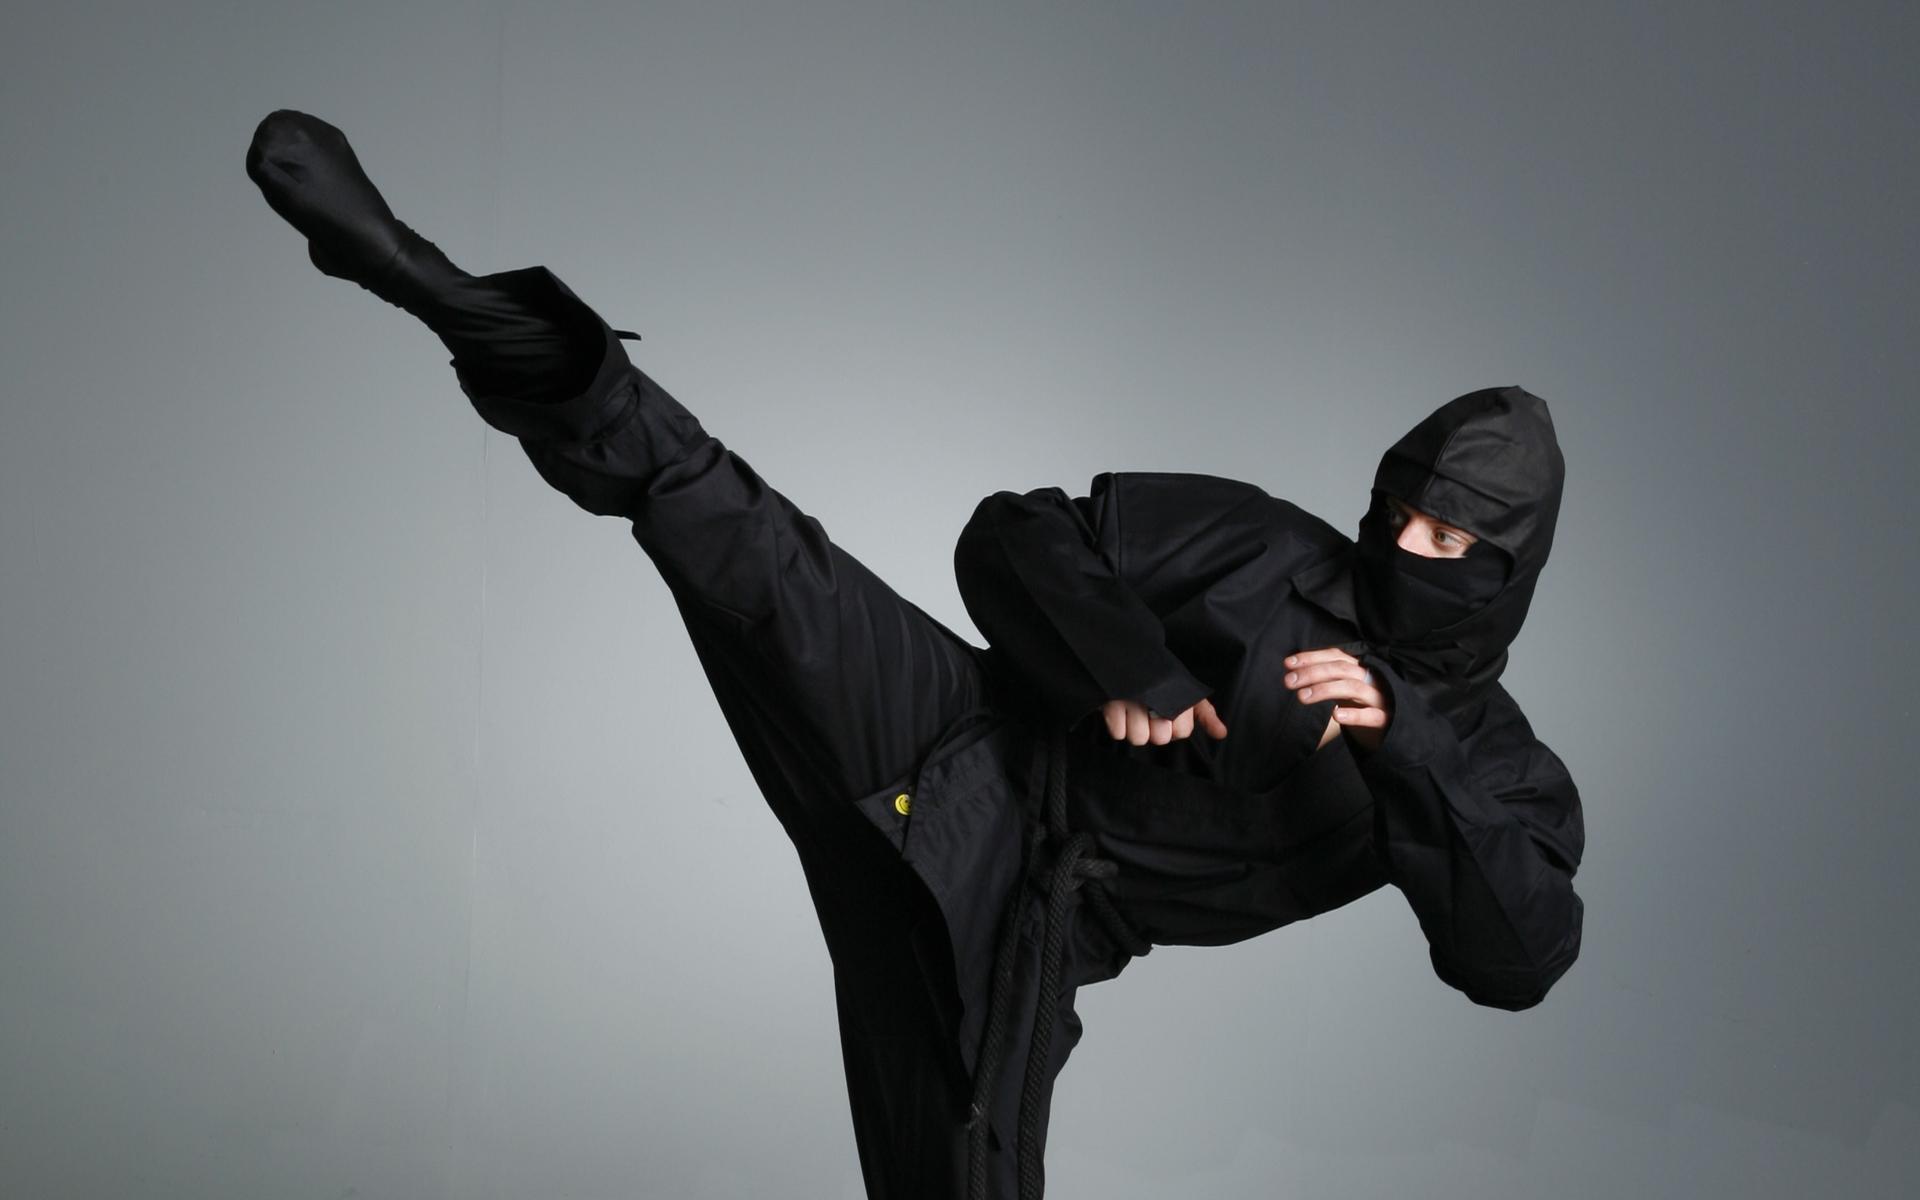 Ниндзя - воины невидимки